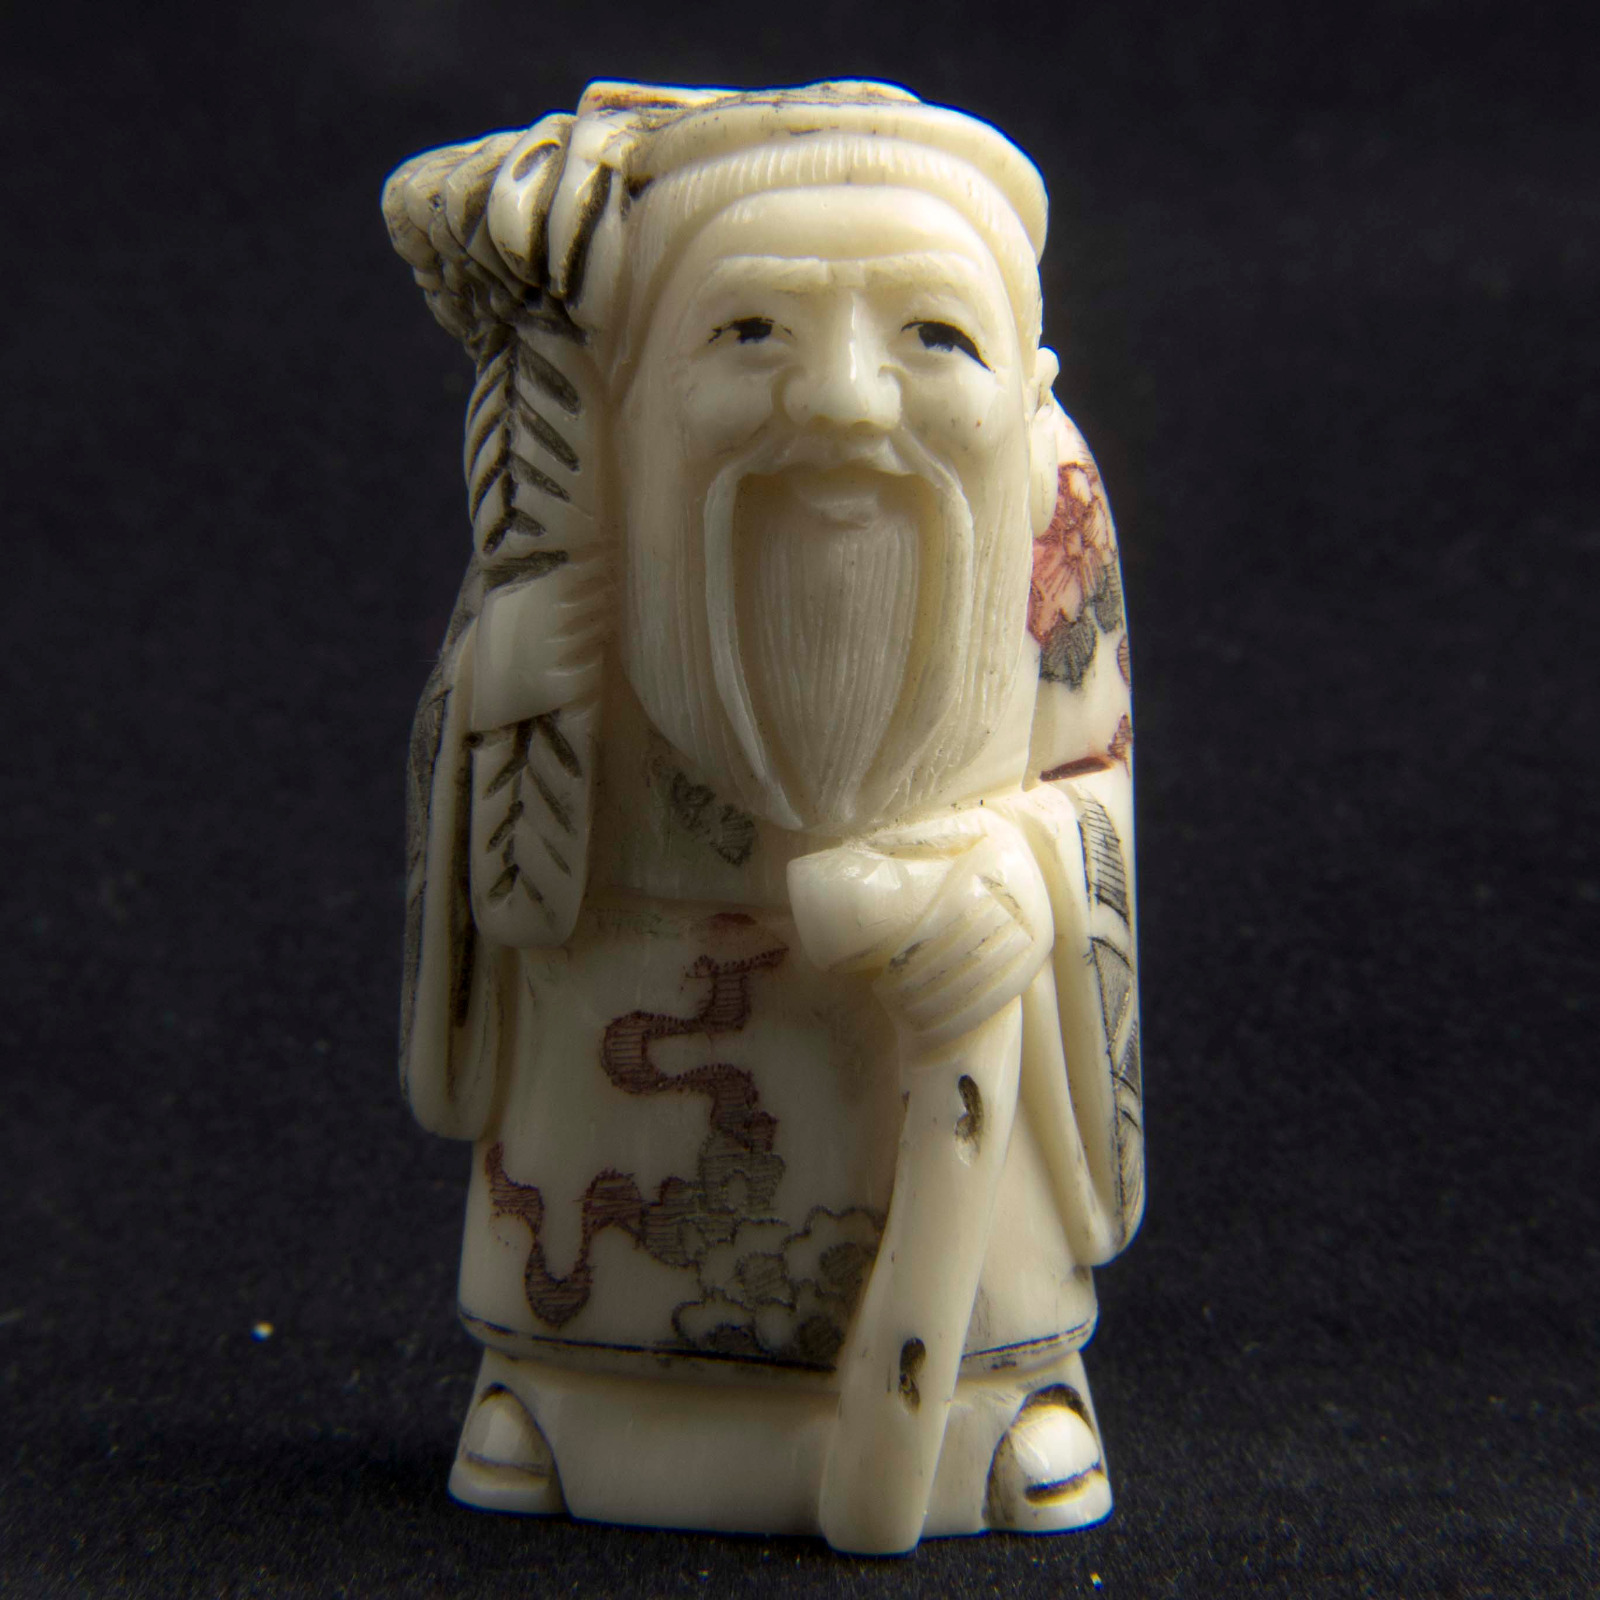 Japanese Carved Bone Netsuke 3211 La180387 Loveantiques Com